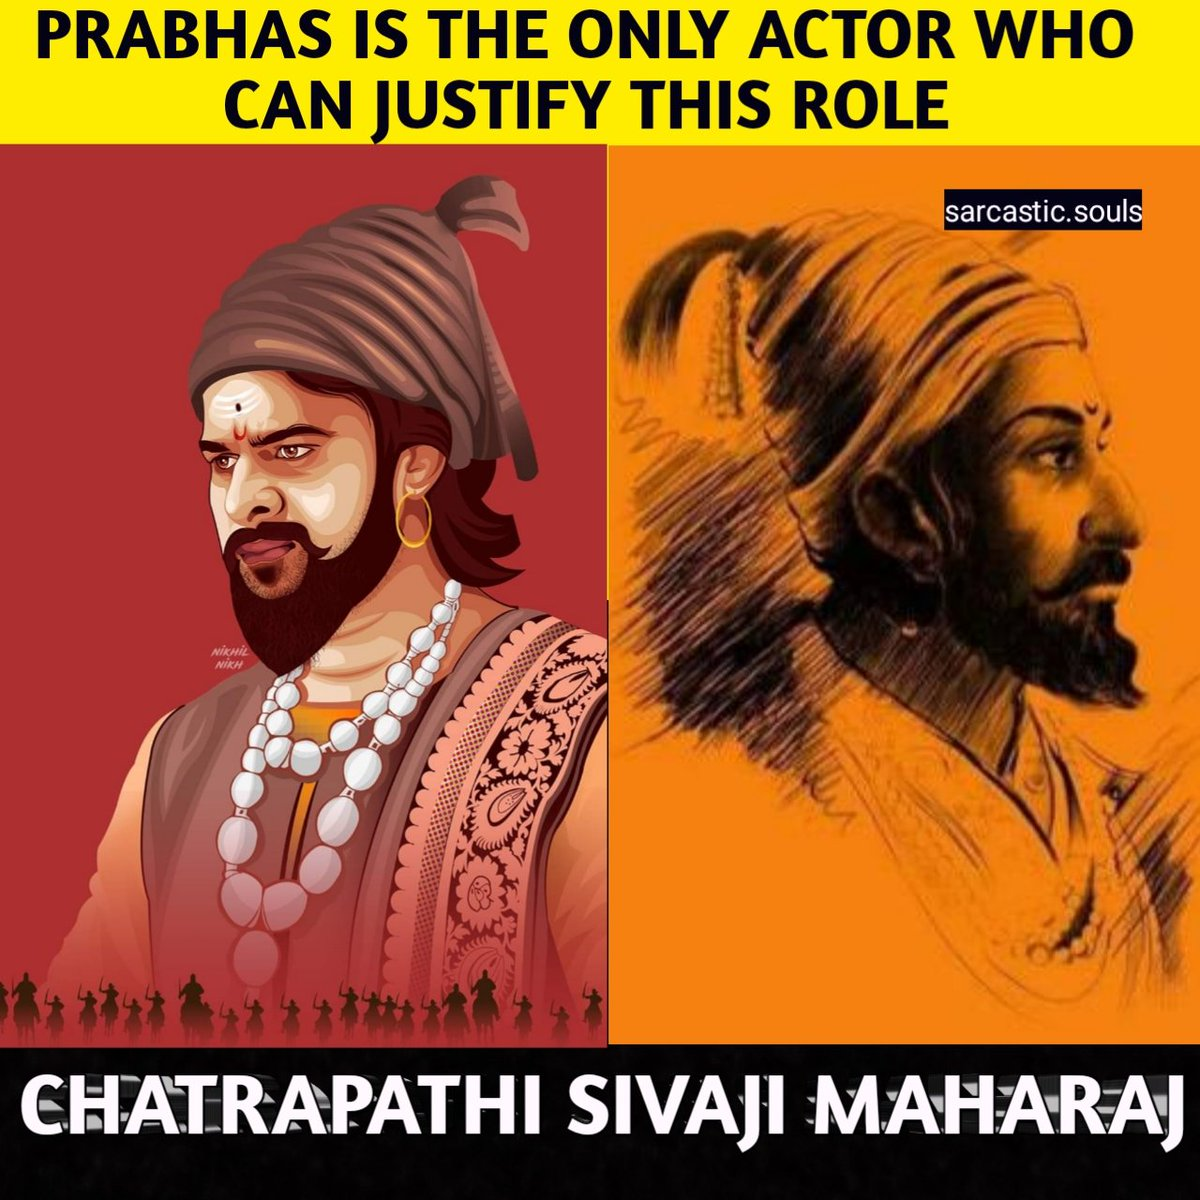 CHATRAPATHI SIVAJI MAHARAJ #Prabhas #sivaji #Maharashtra #ChatrapathiShivaji #Gujaratpic.twitter.com/dBFD9zSRHu